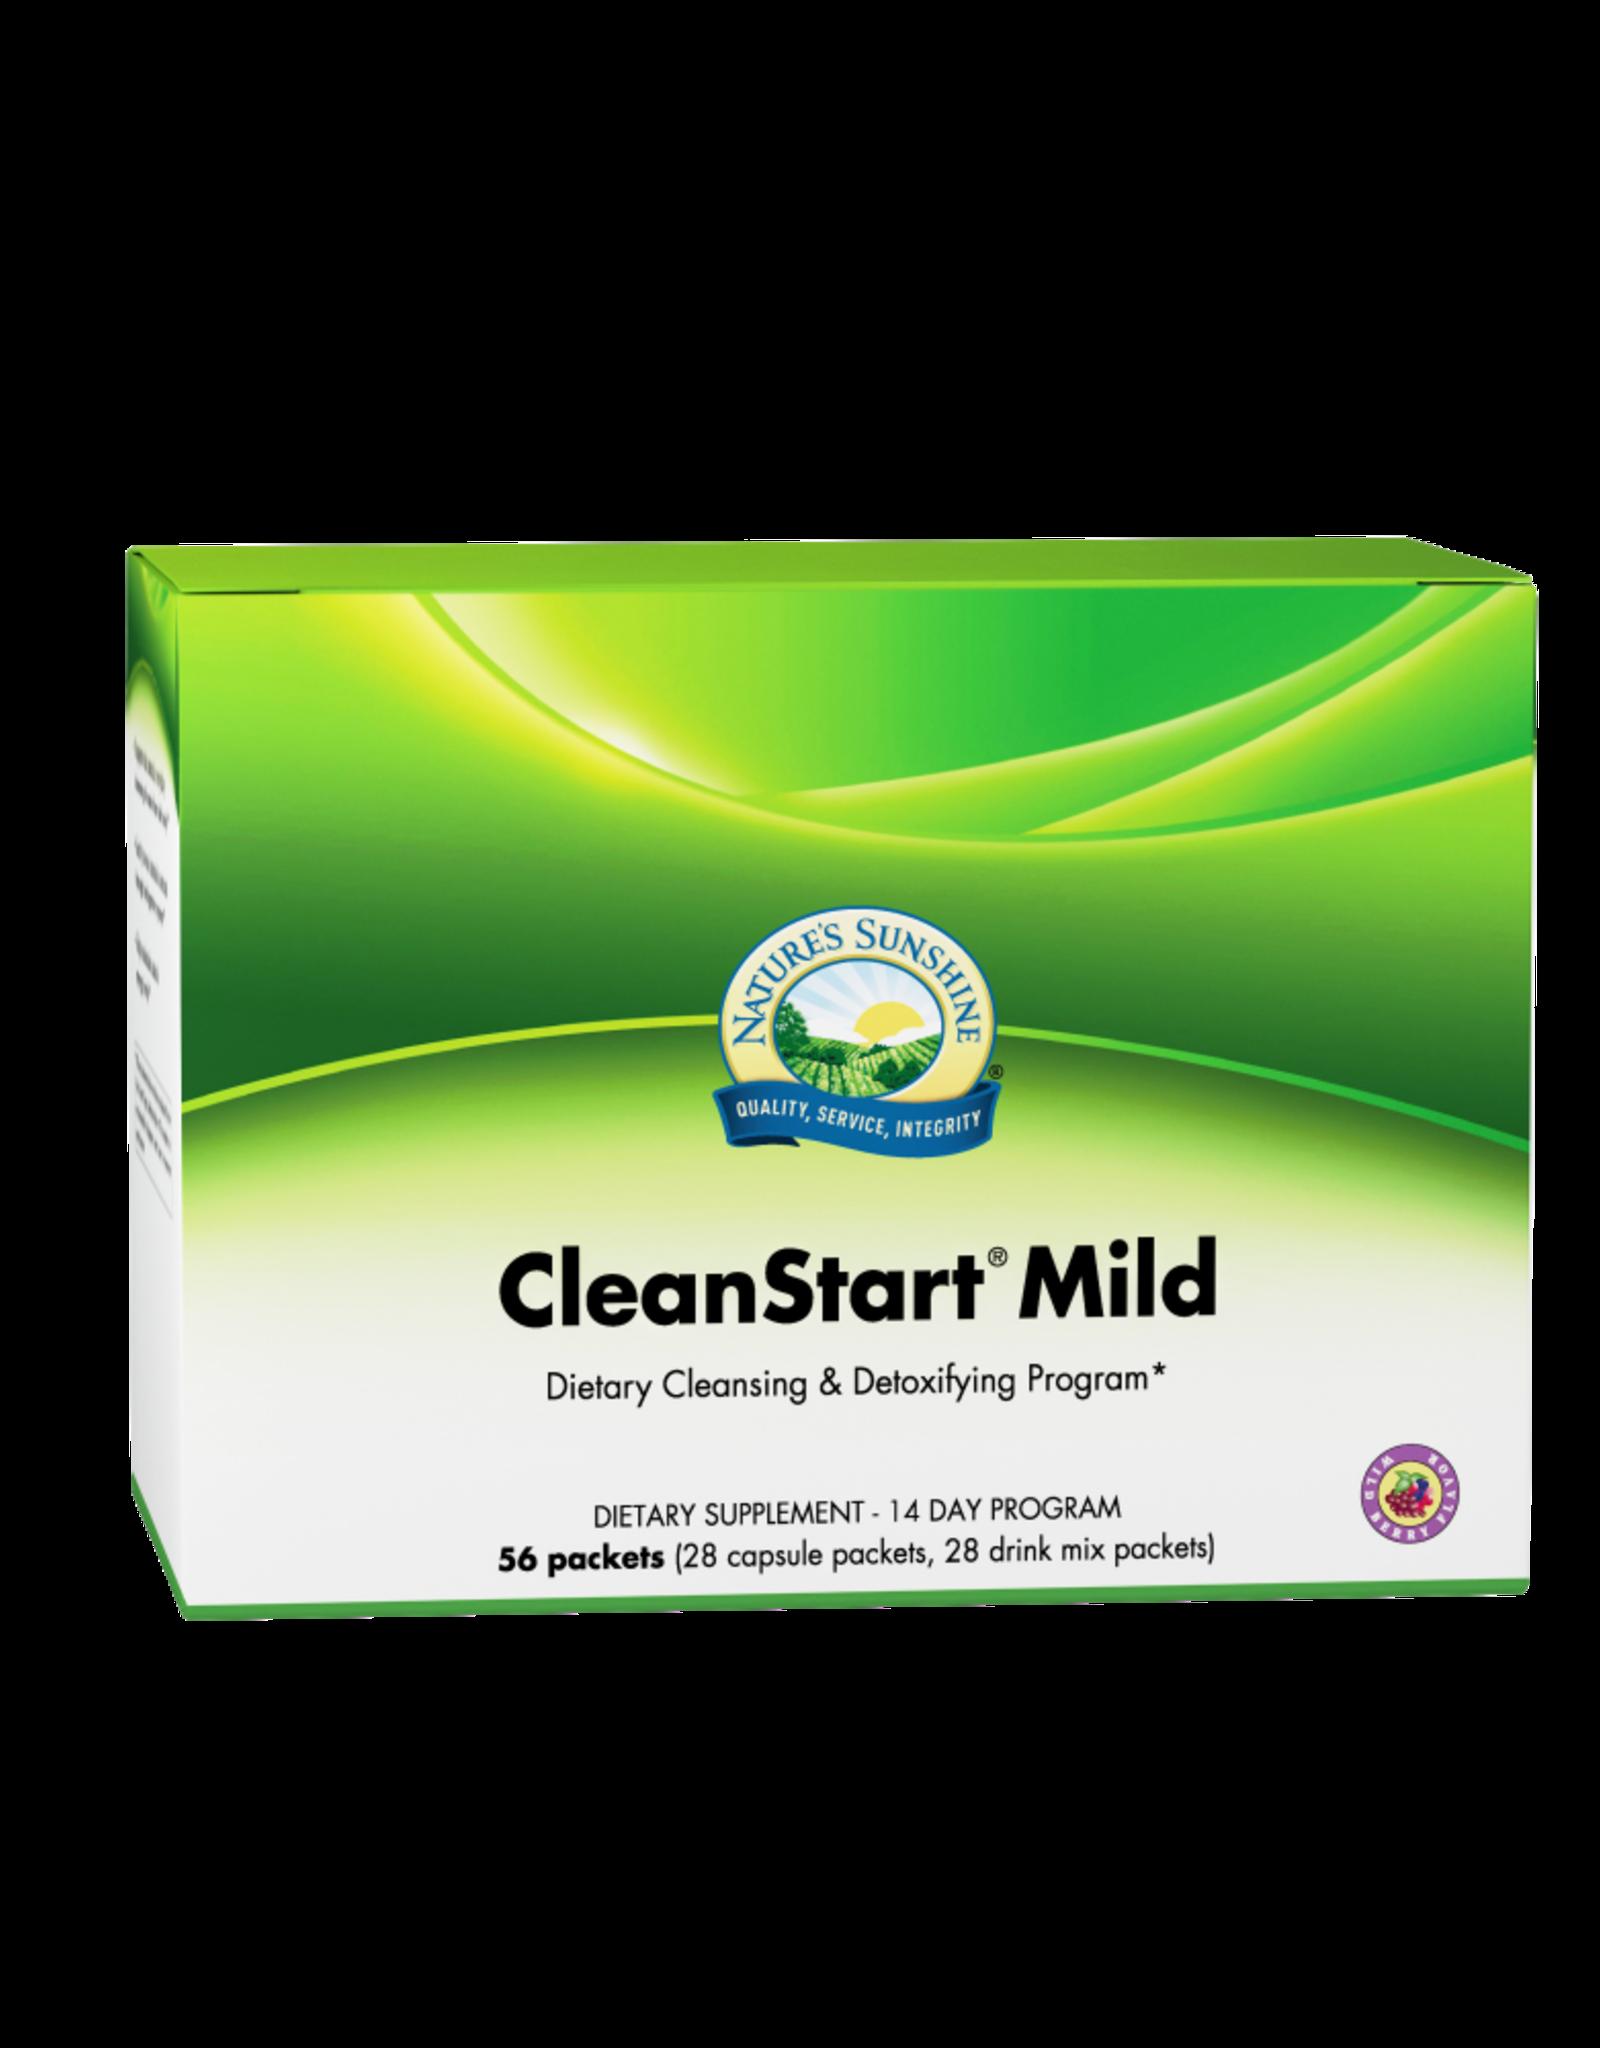 Nature's Sunshine CleanStart® Mild (14 day)